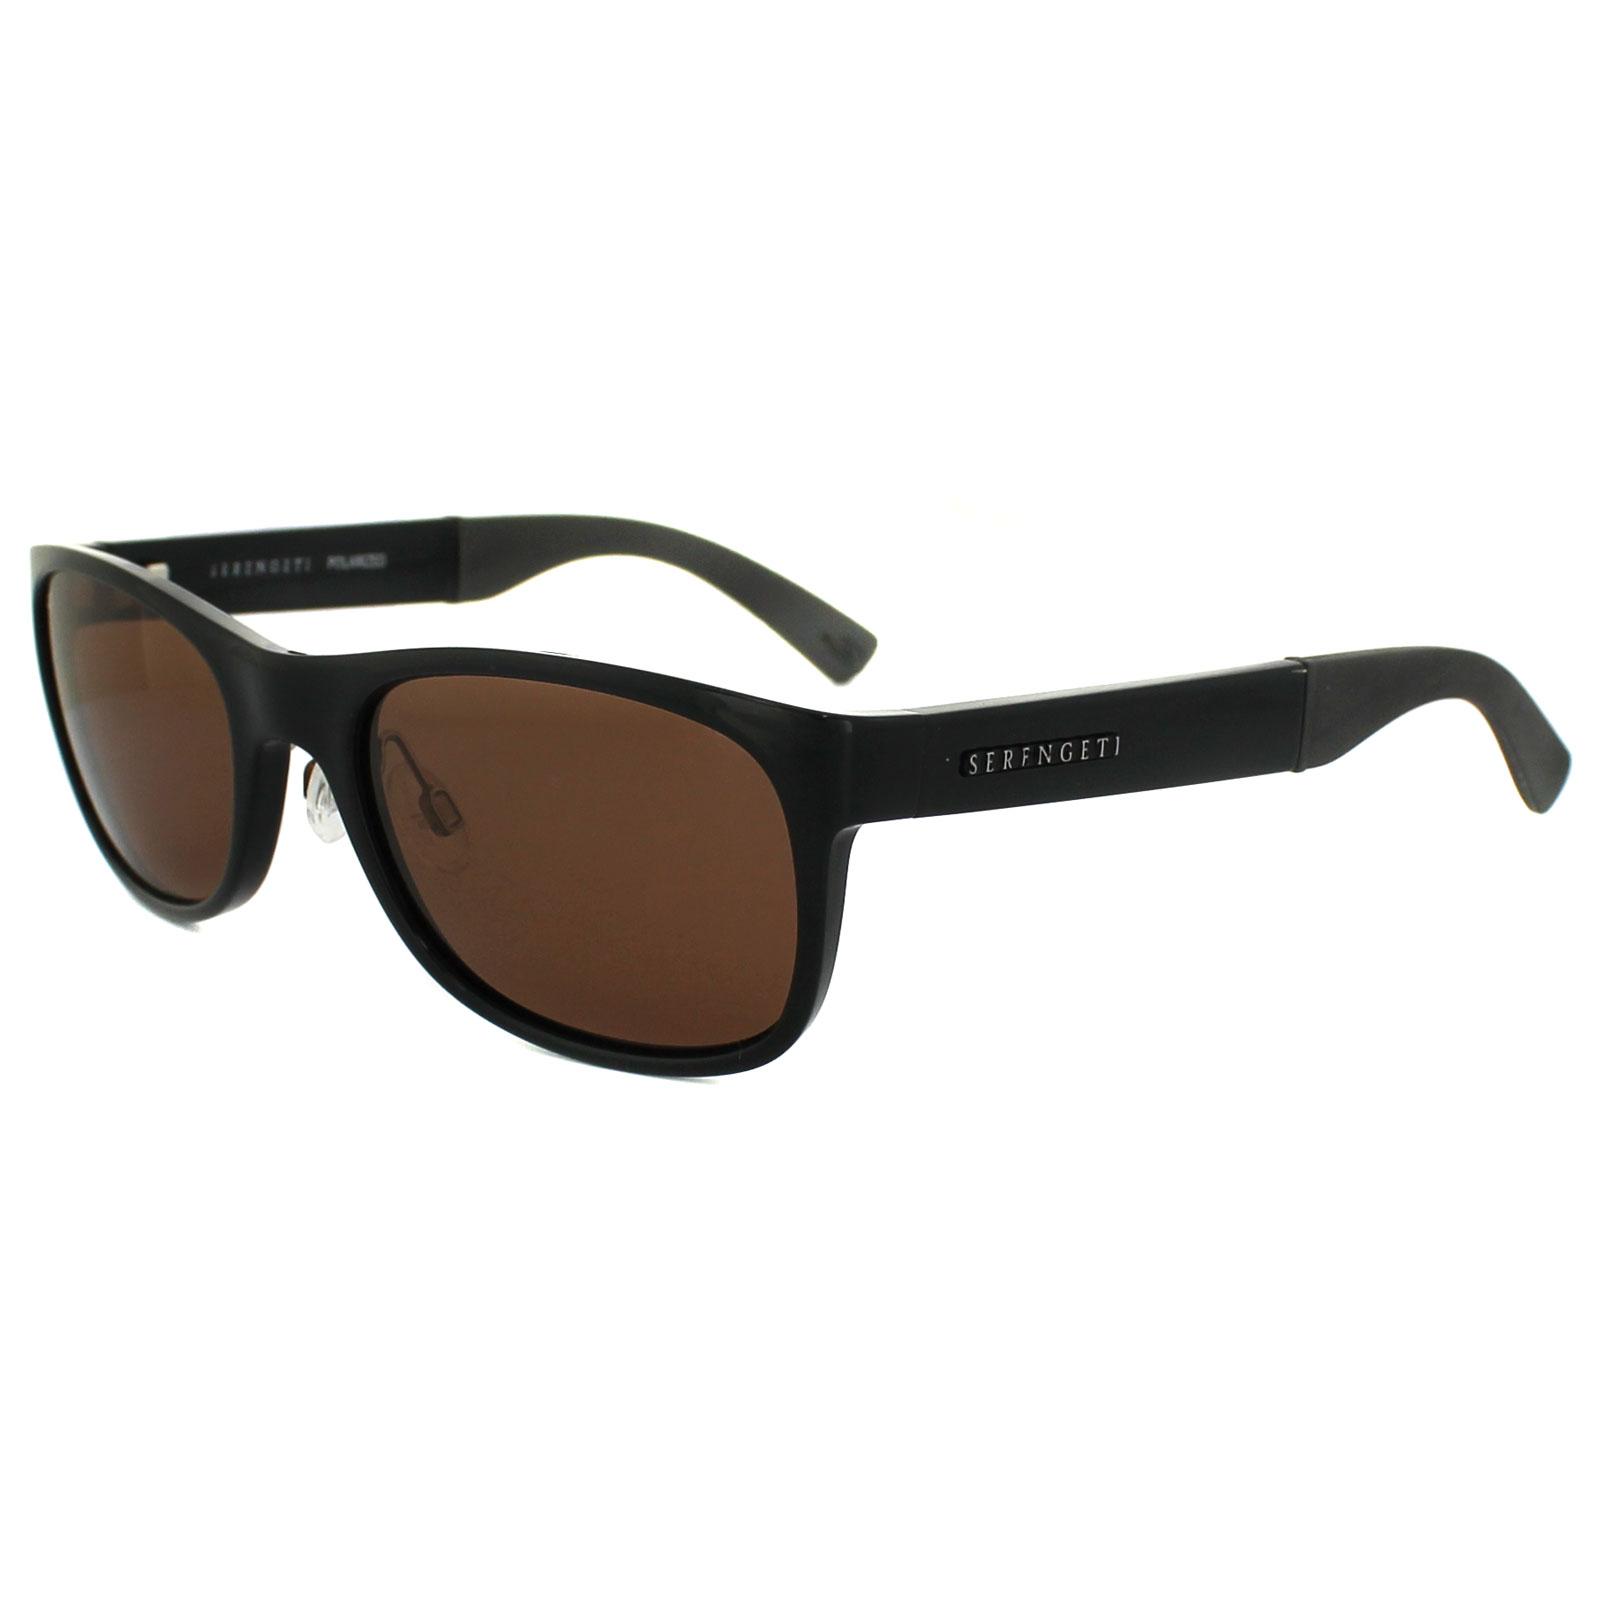 1aced0c330d Sentinel Serengeti Sunglasses Piero 7634 Shiny Black Brown Drivers Polarized